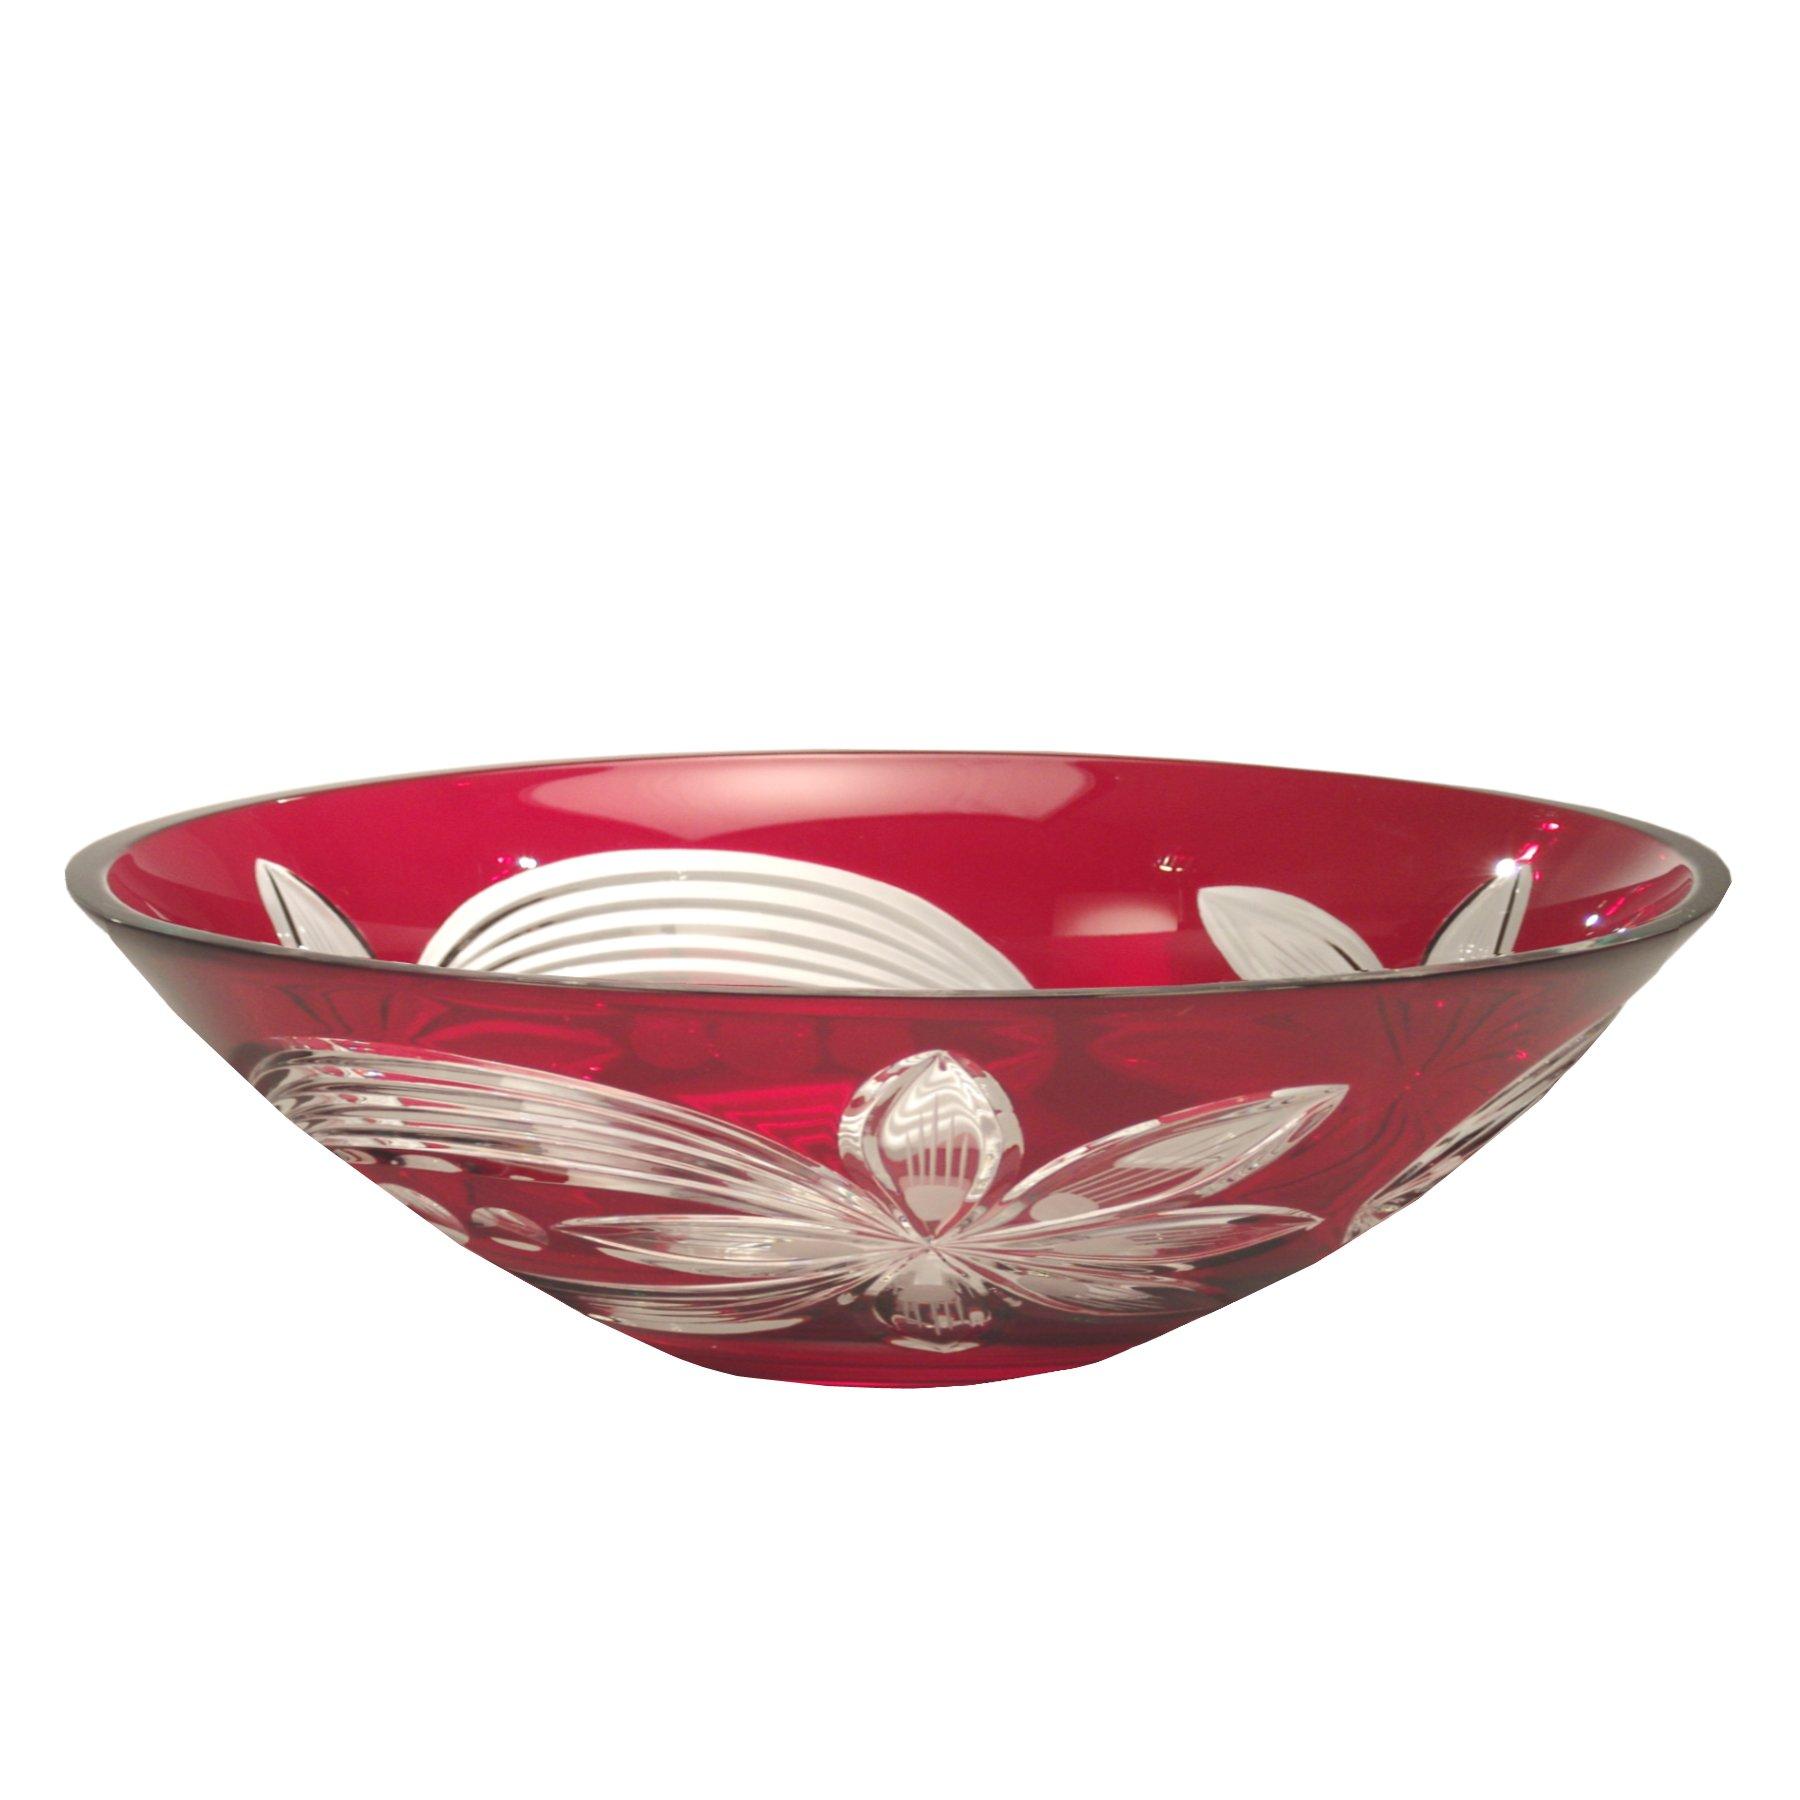 Dale Tiffany GA60836 Red Floral Decorative Crystal Bowl, 13-Inch by 3-3/4-Inch